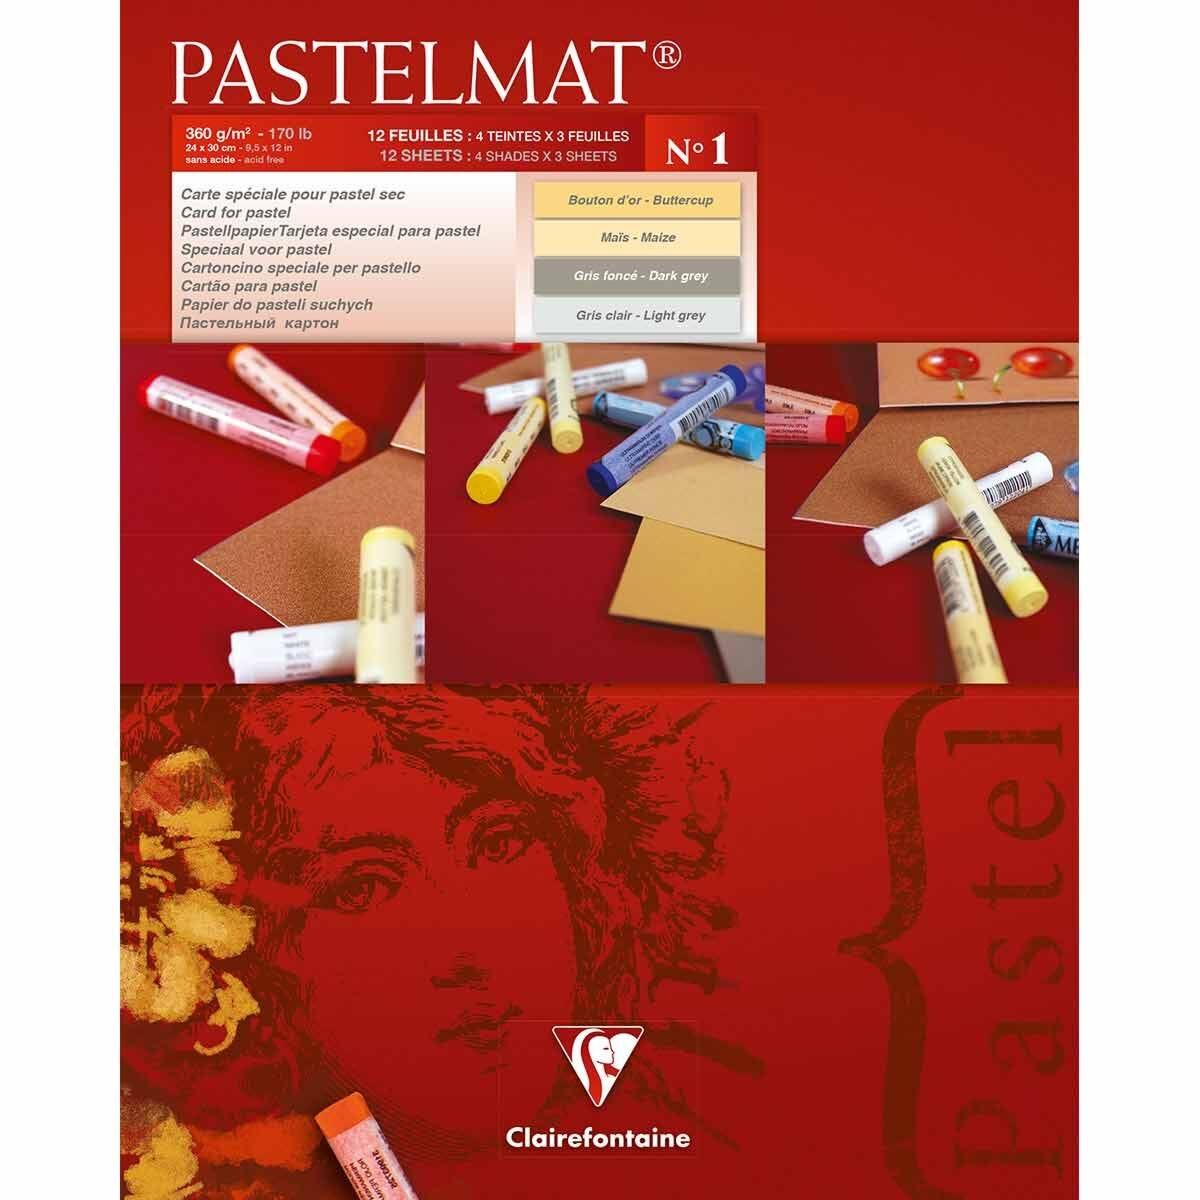 Clairefontaine Pastelmat Pad No 1 24x30cm